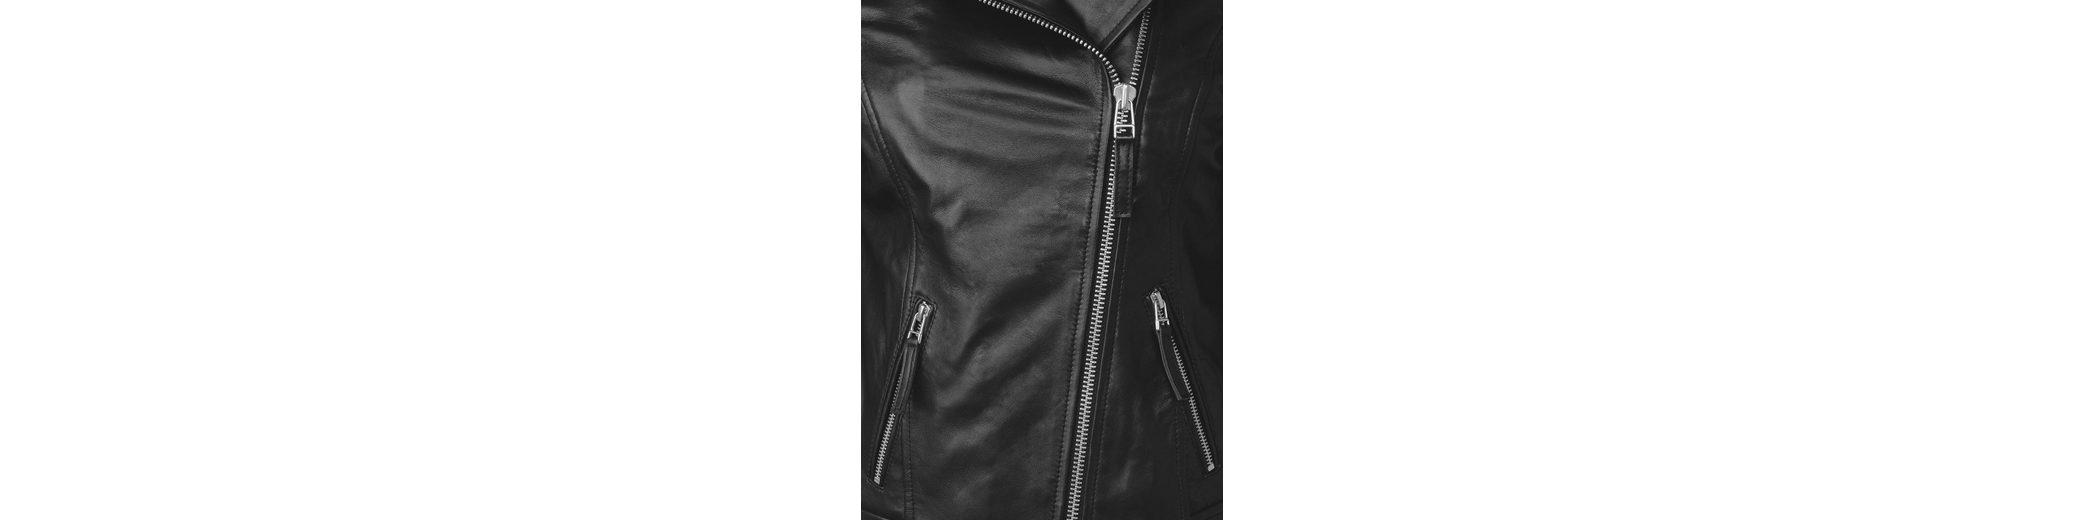 CECIL Biker Style Leder Jacke Neueste syBNTrZG4N